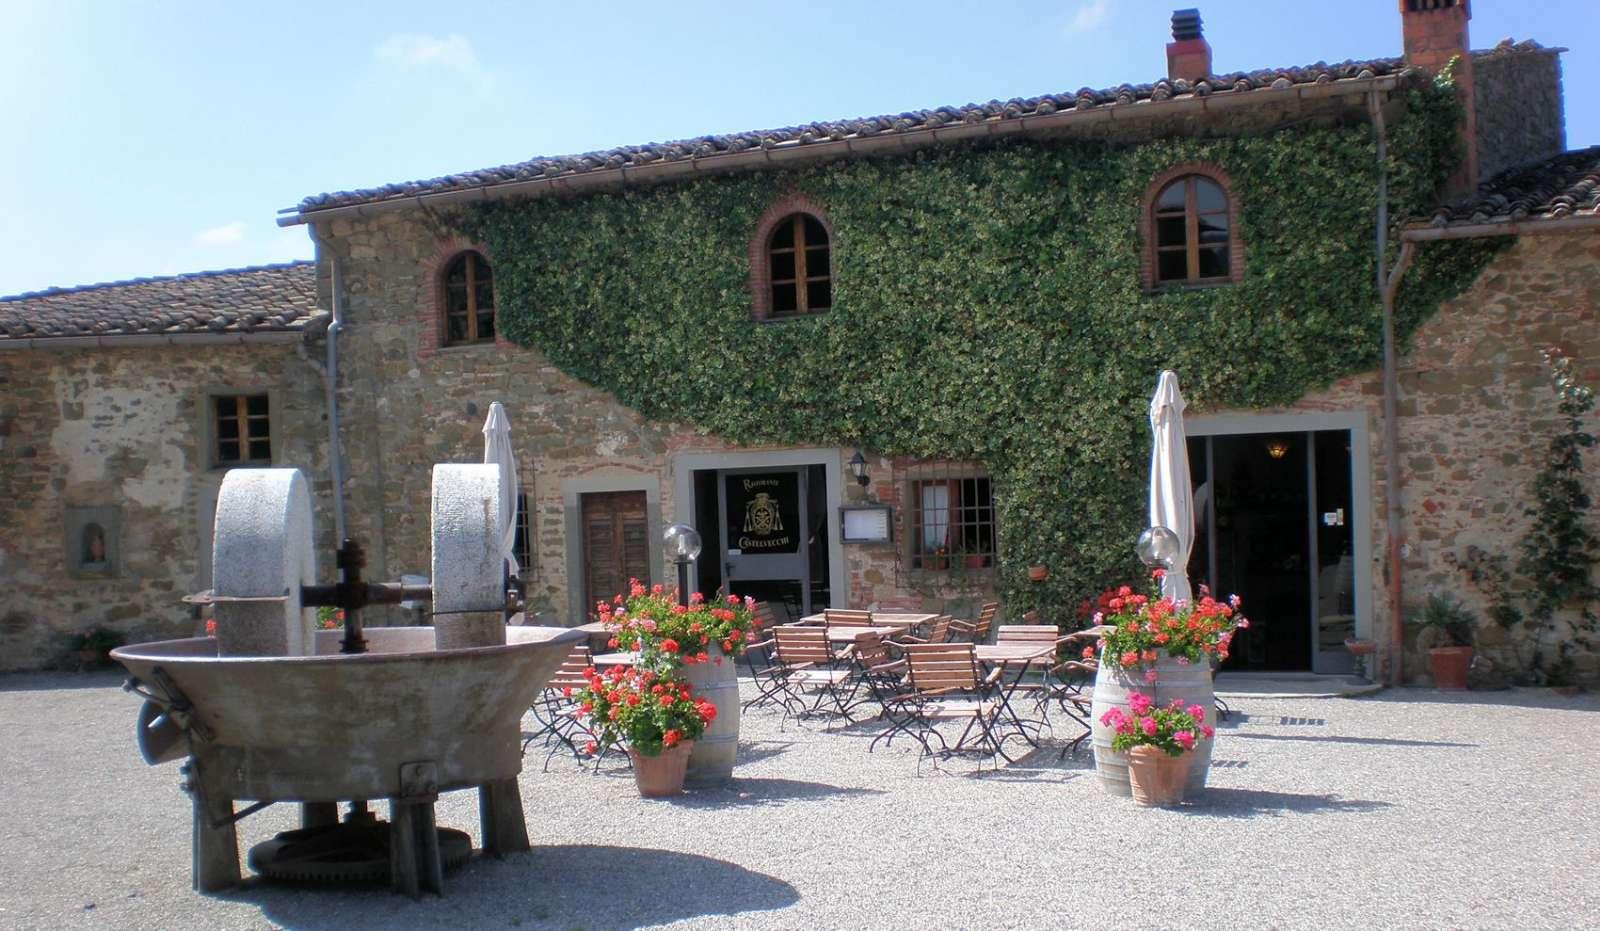 The small restaurant on Castelvecchi square